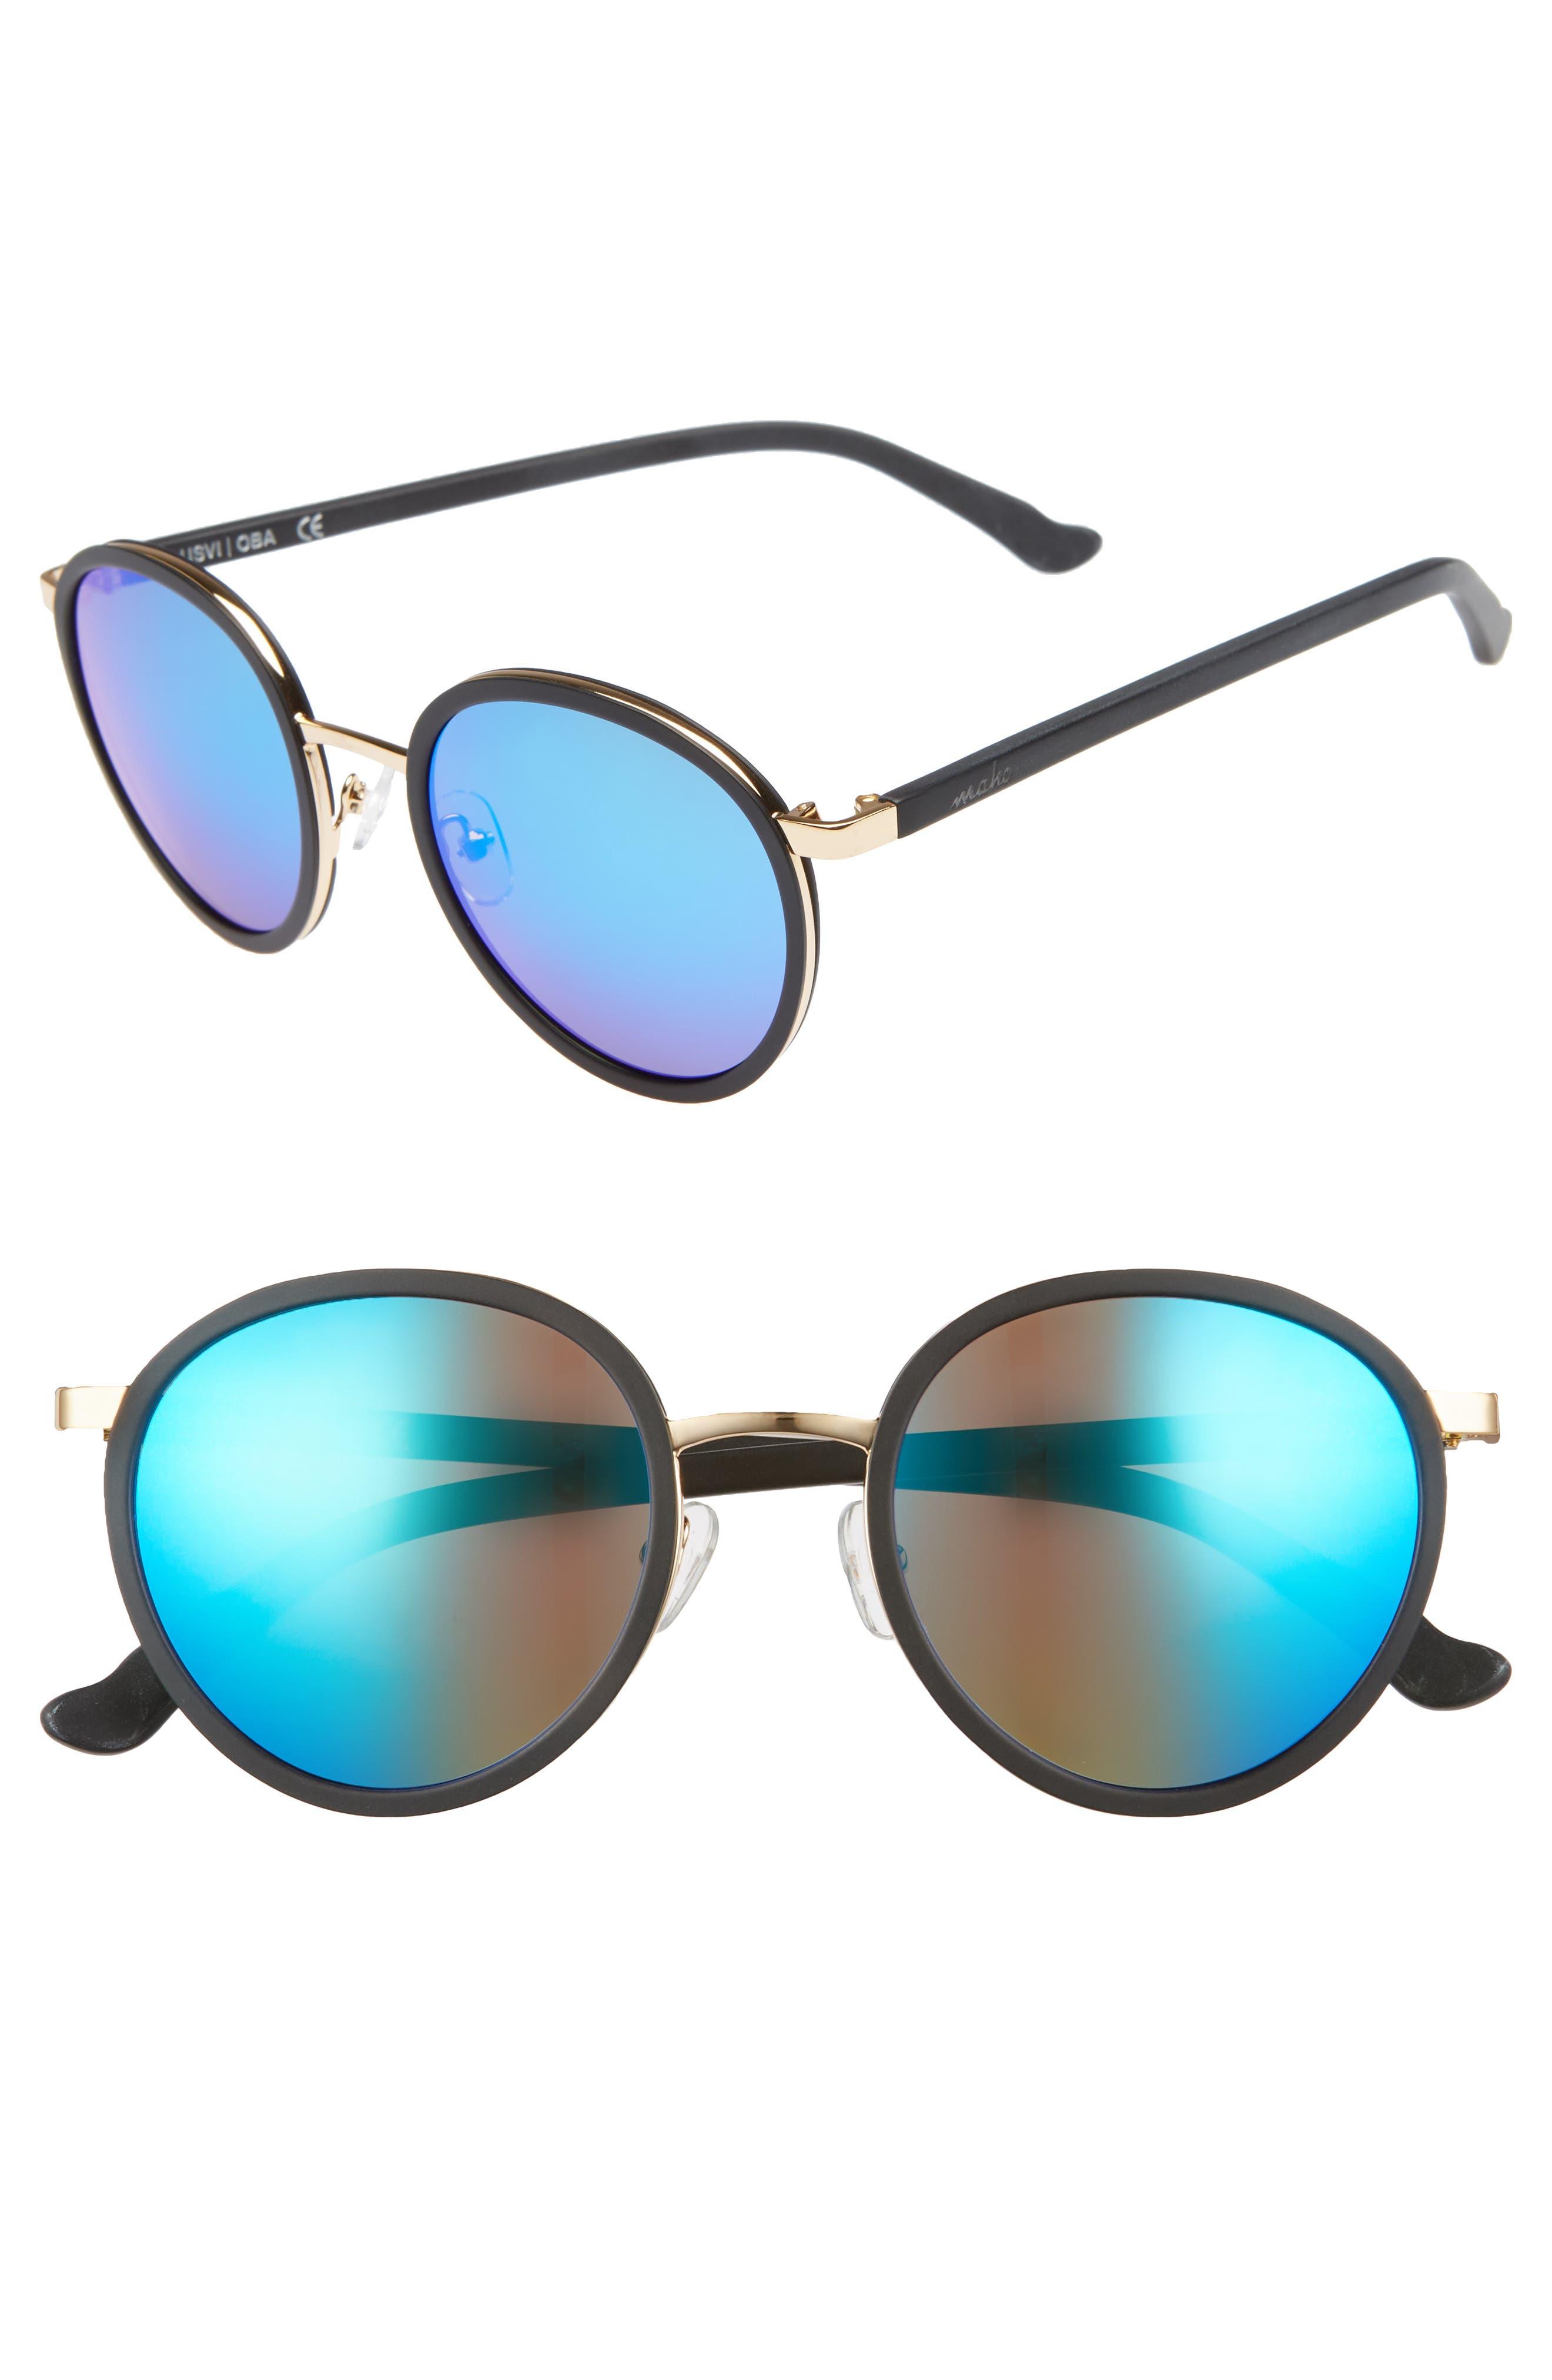 Cabo 50mm Polarized Round Sunglasses,                             Main thumbnail 1, color,